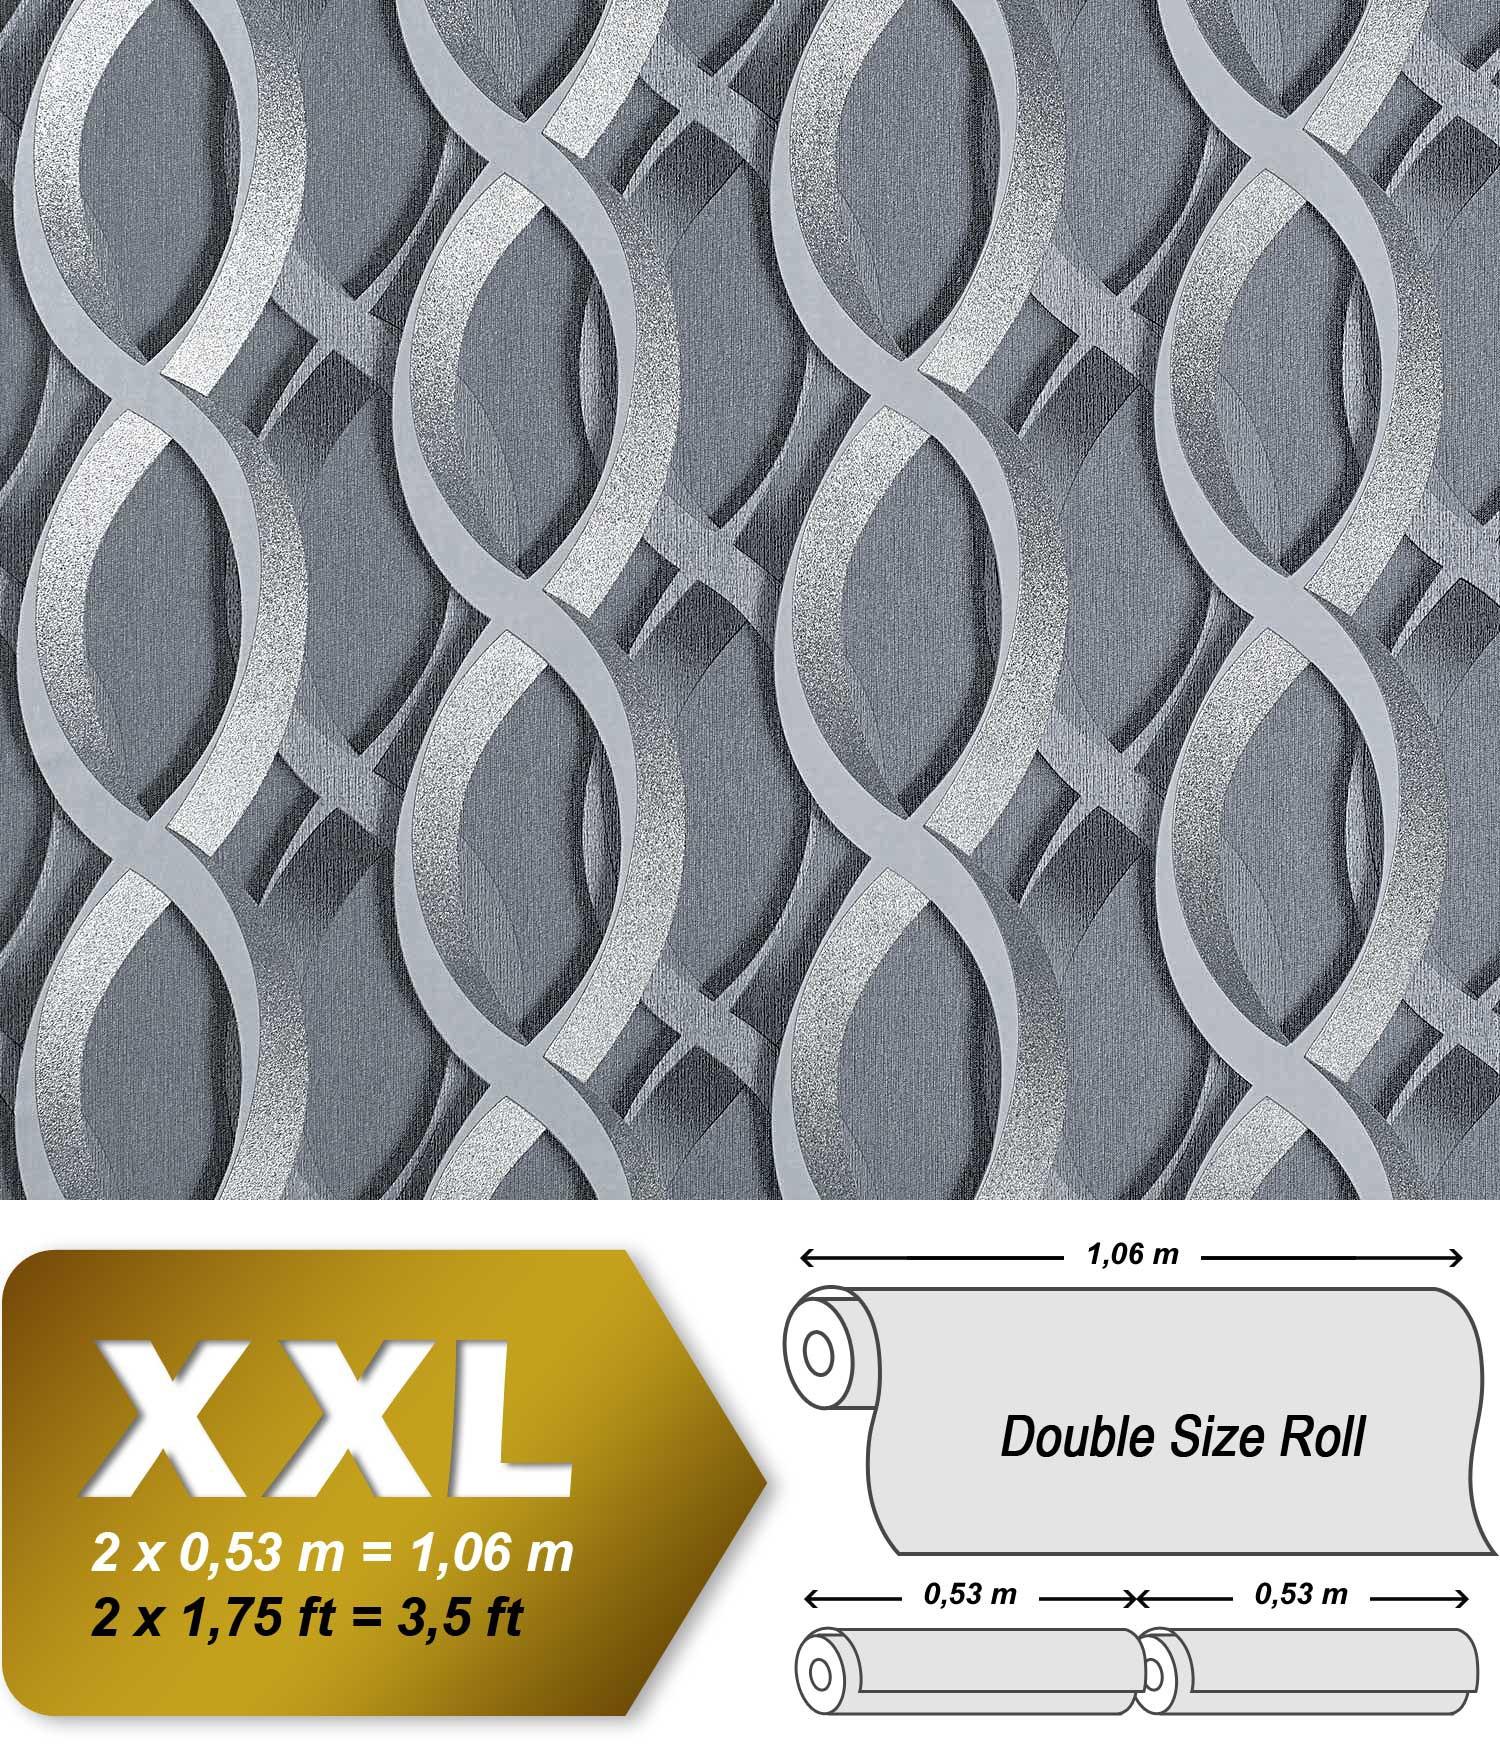 Edem 601 96 designer vliestapete 3d ketten muster retro - Vliestapete grau ...